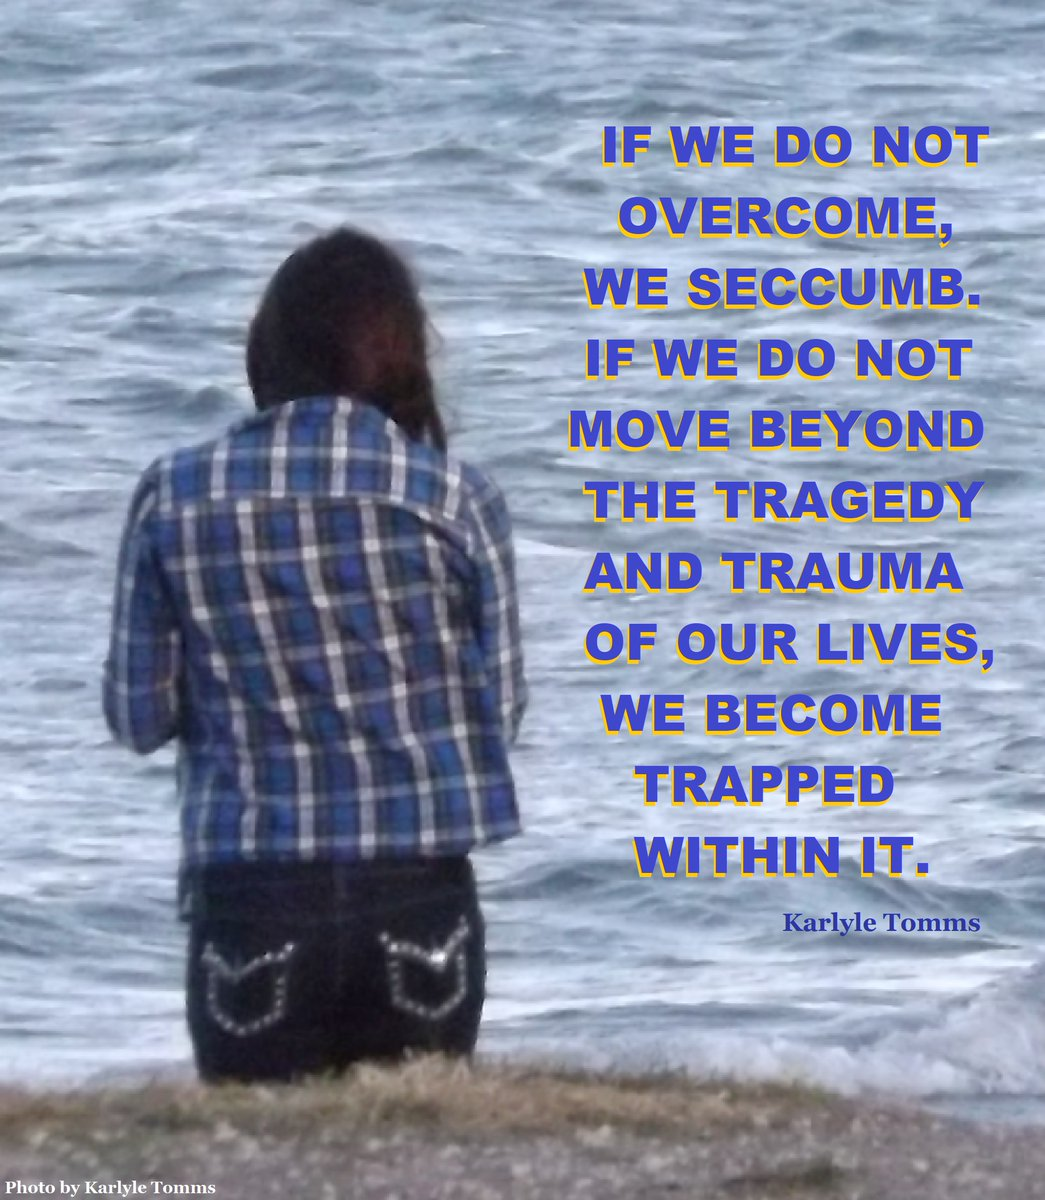 Retweets appreciated. #recoveryquotes #traumasurvivor http://karlyletomms.compic.twitter.com/2pHJAHGQjv